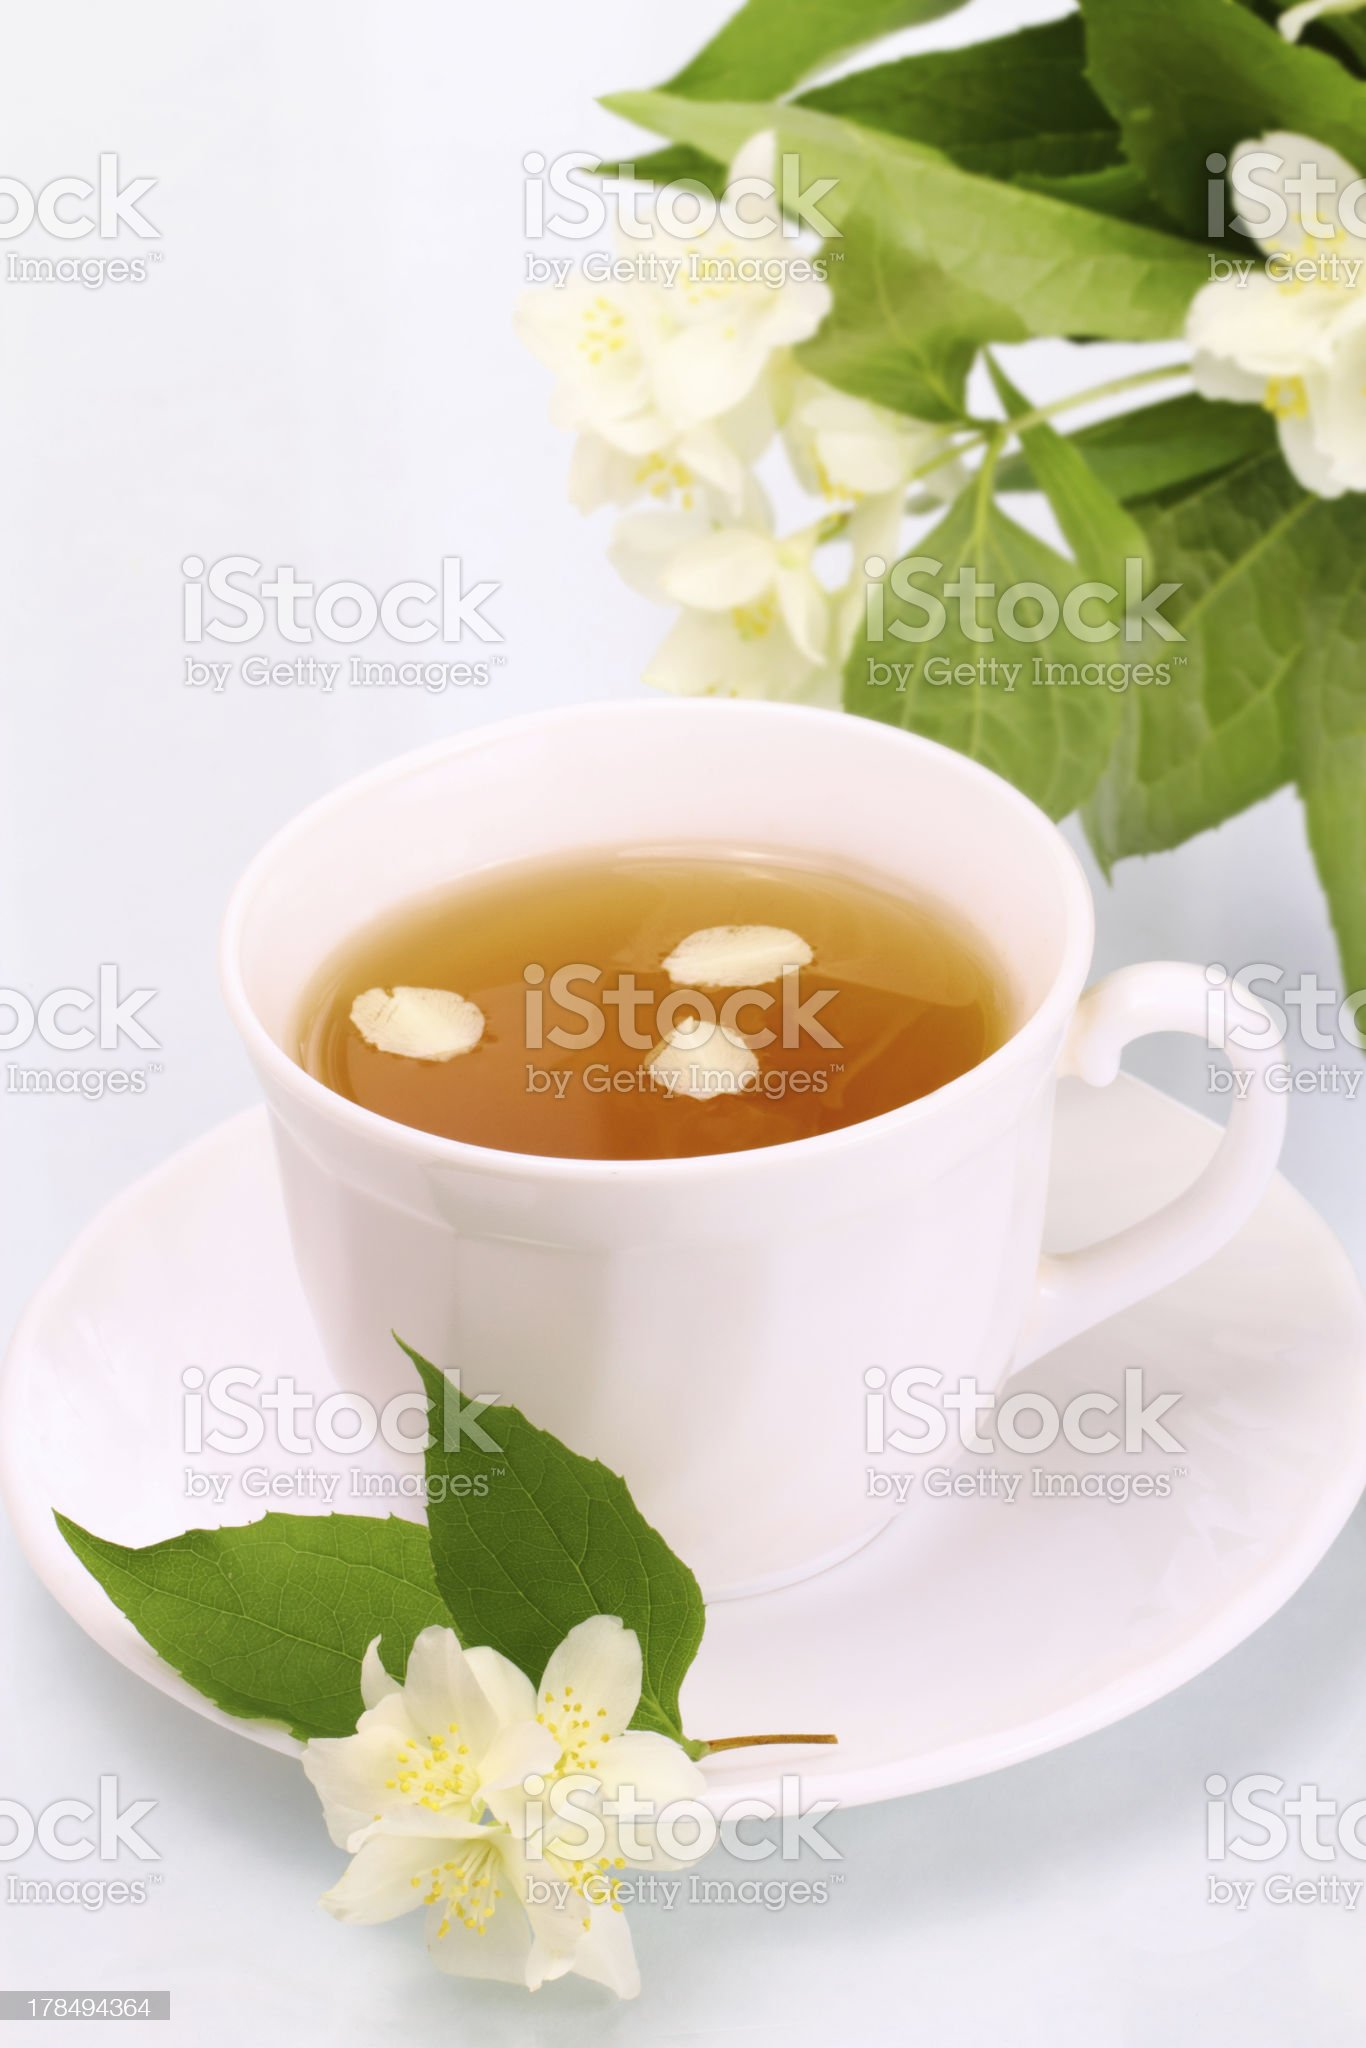 Tasty jasmine tea and beautiful flowers royalty-free stock photo